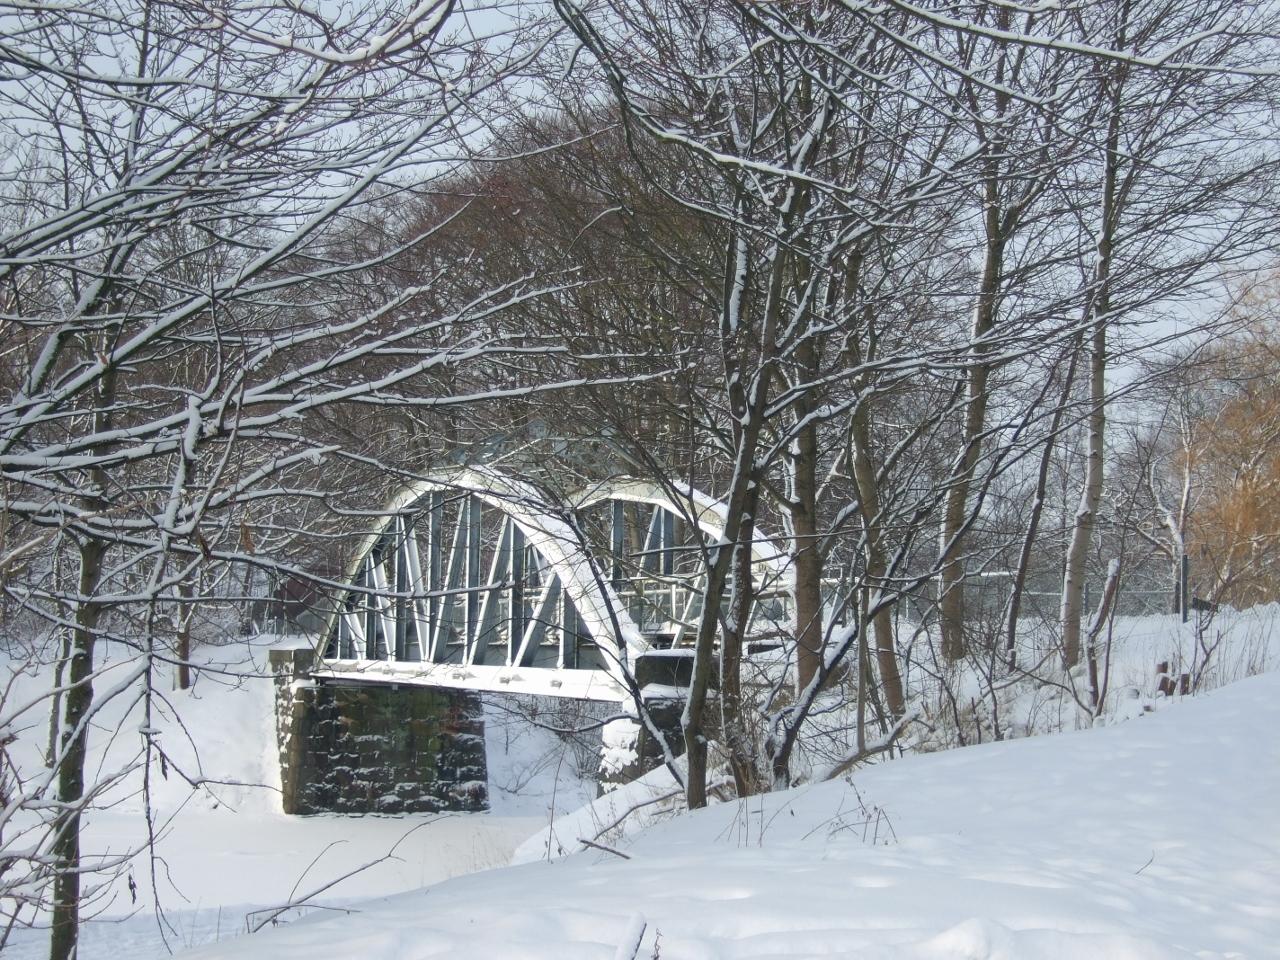 2011-01-05 Vinter 015 (1280x960)